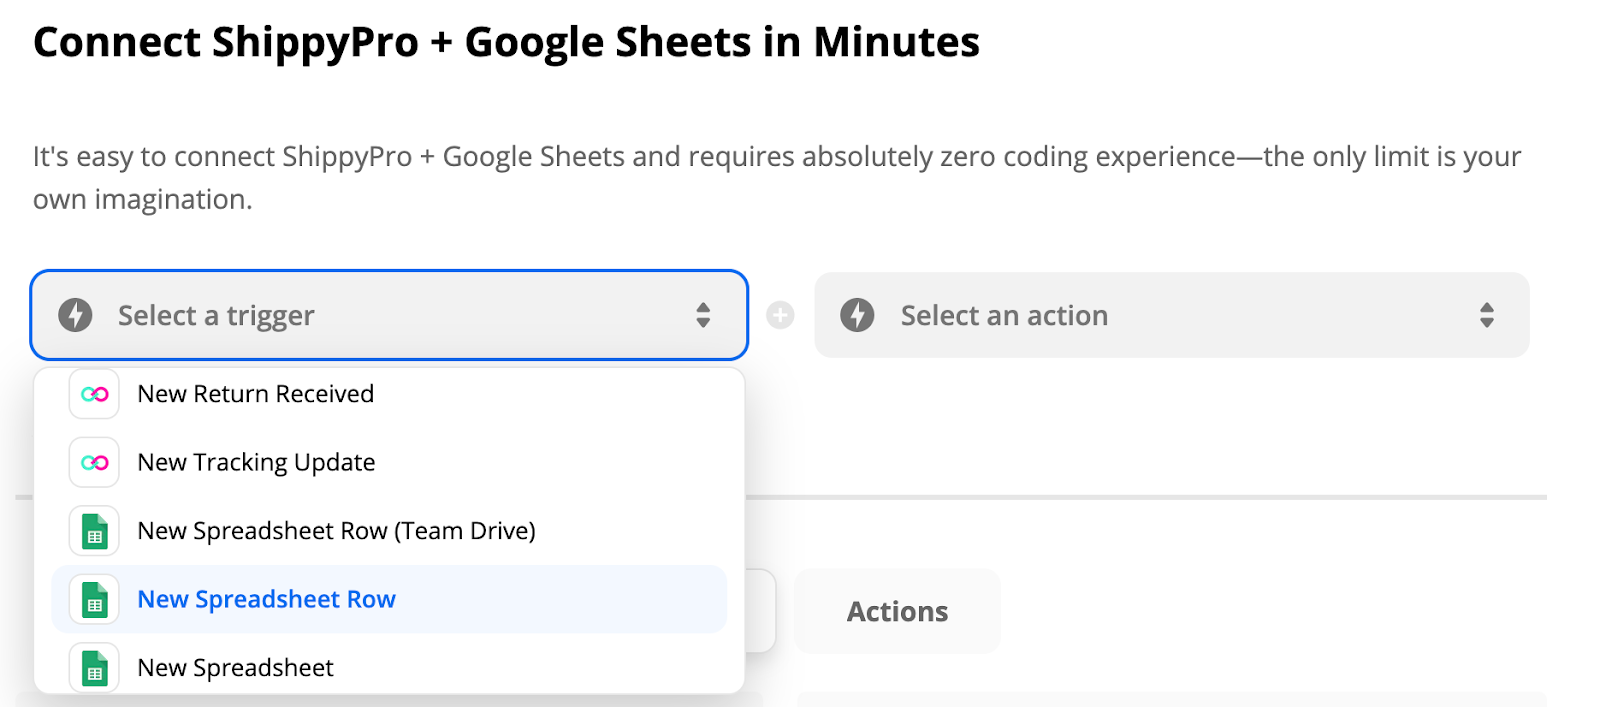 ShippyPro + Google Sheets